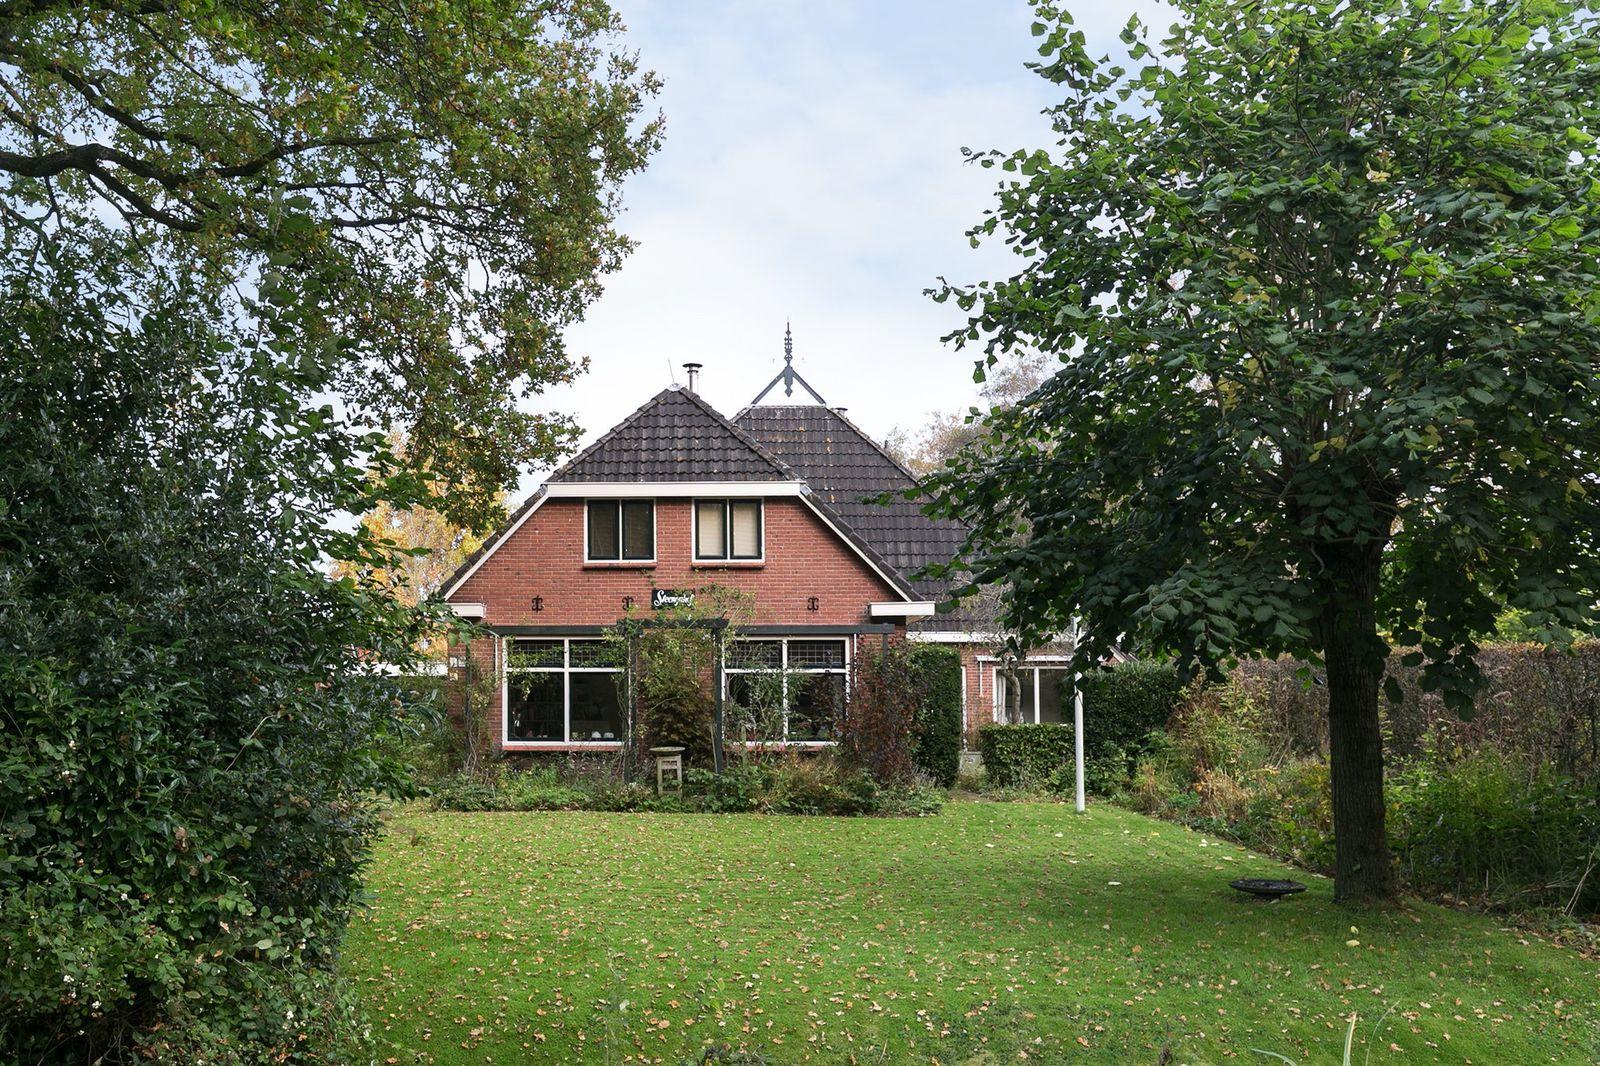 Prandinga 4, Oosterwolde